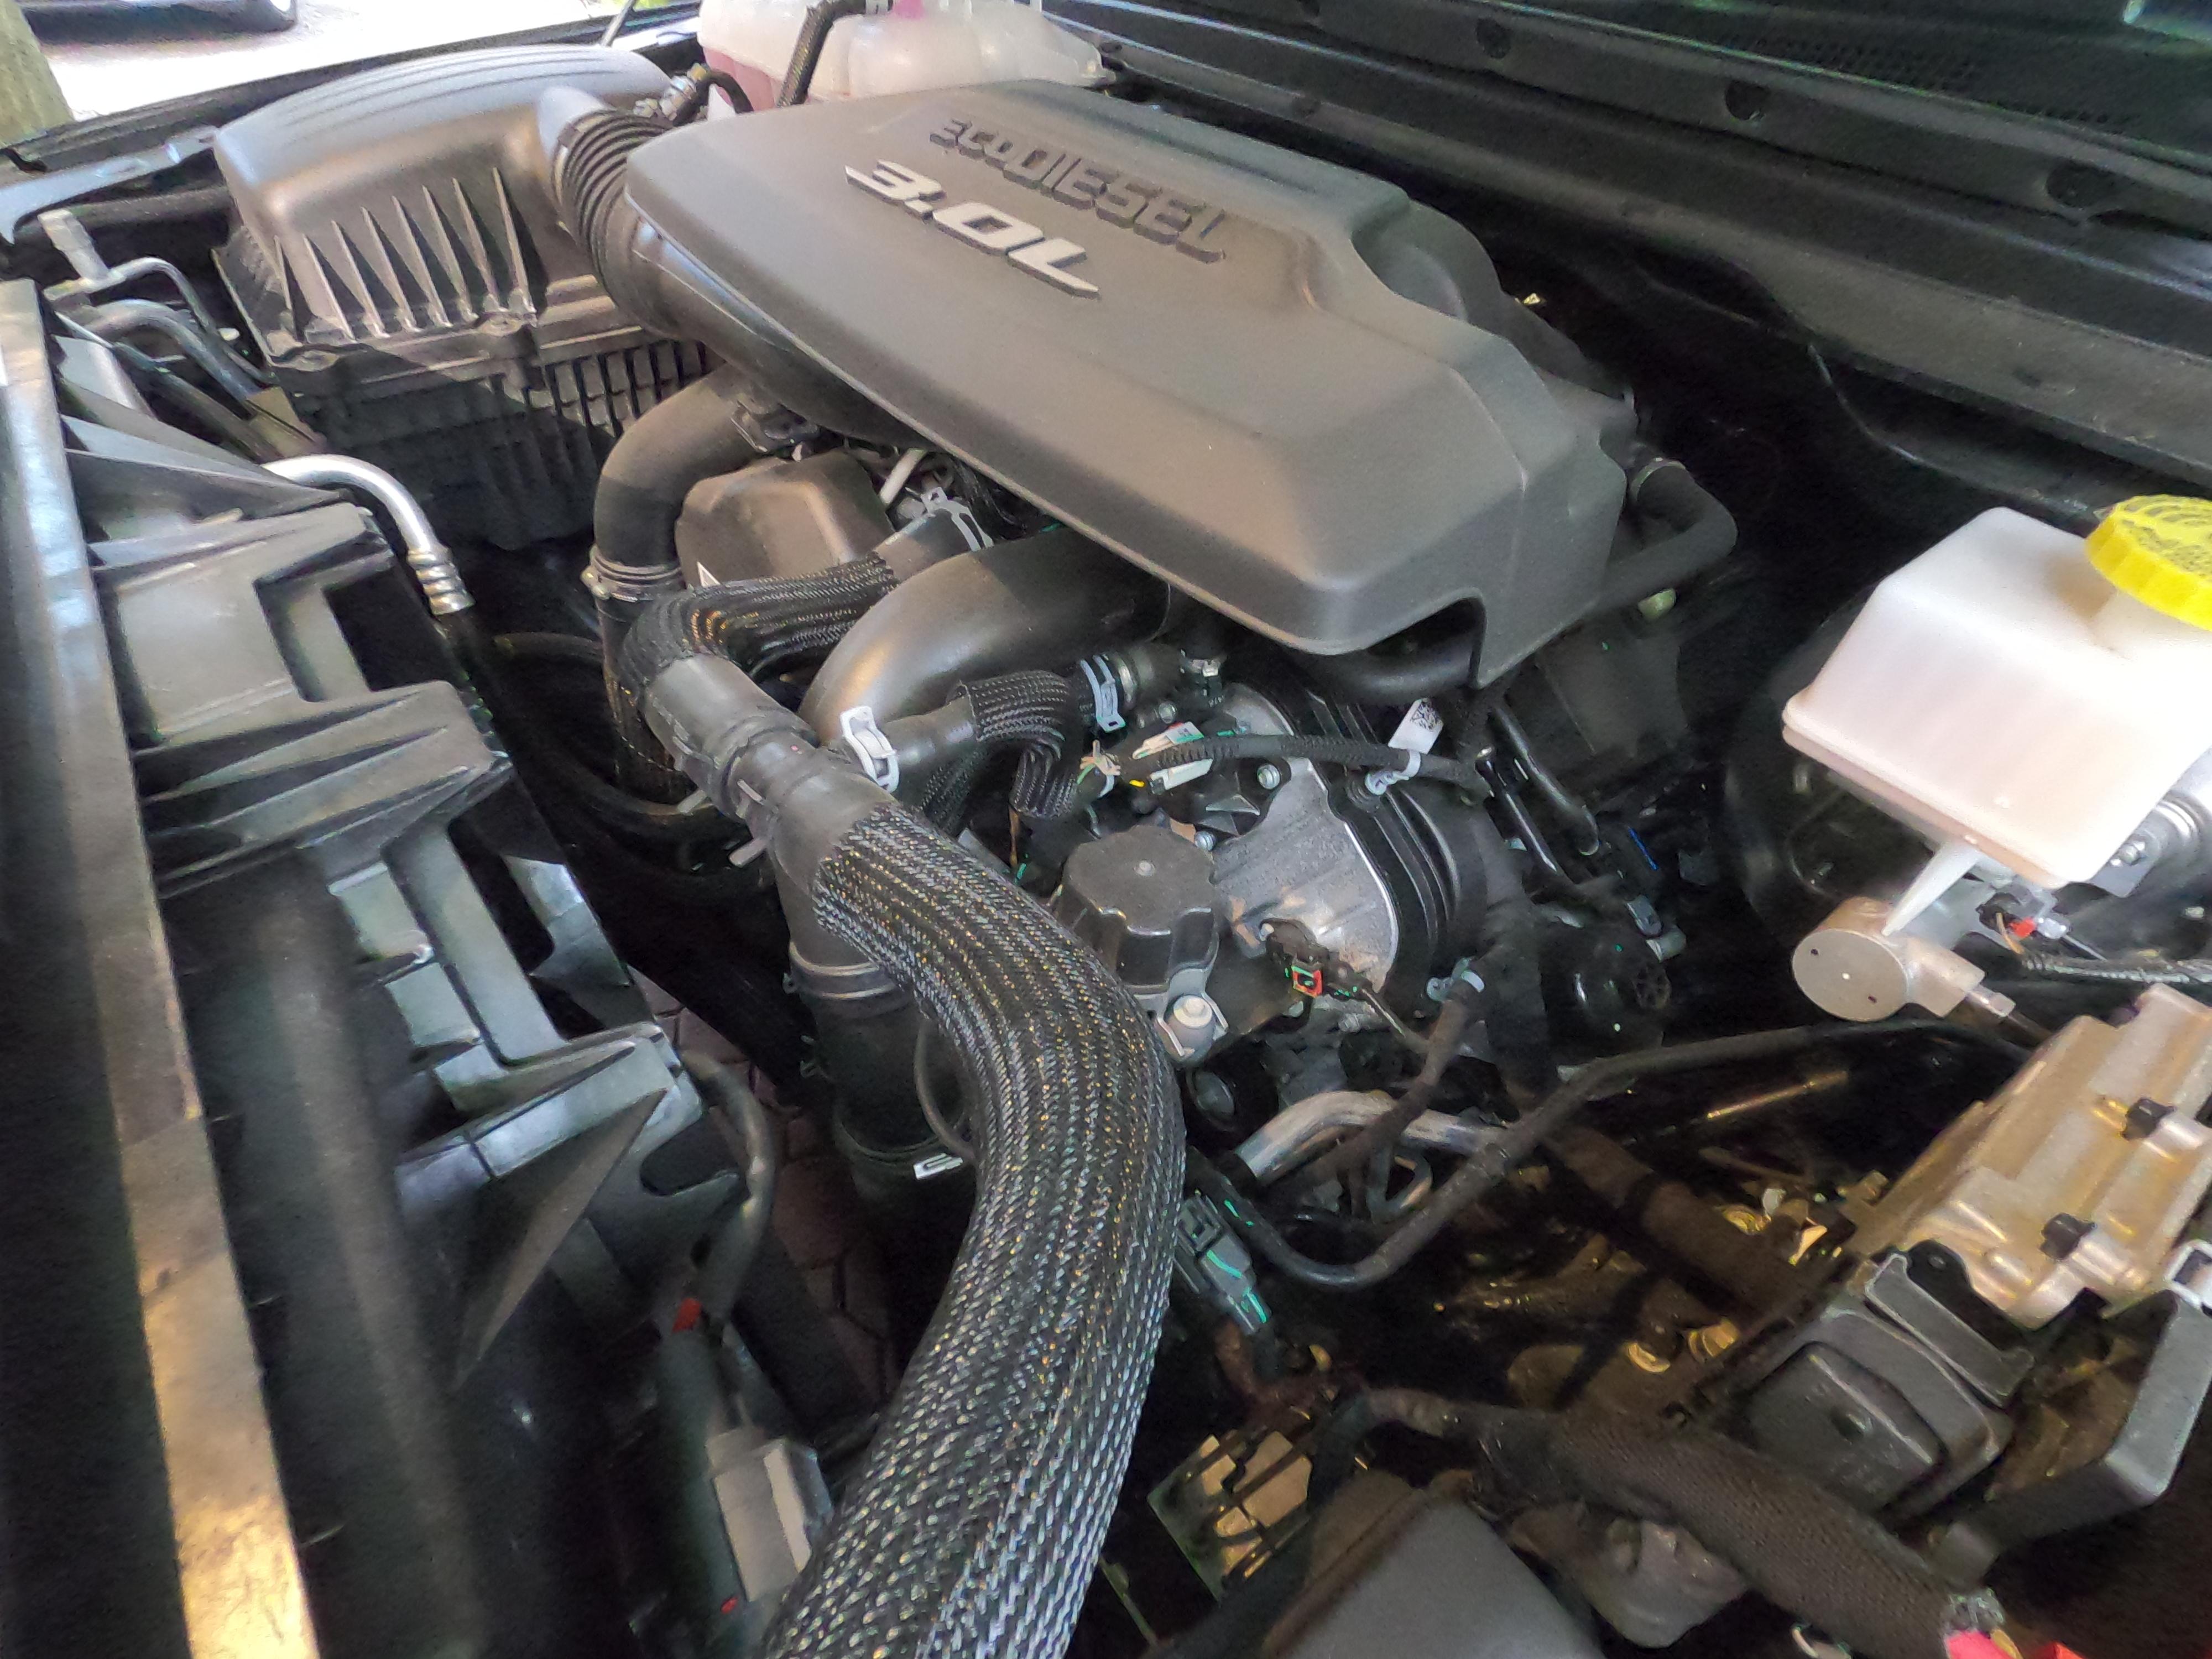 EcoDiesel 3-liter V 6 engine in Ram 1500